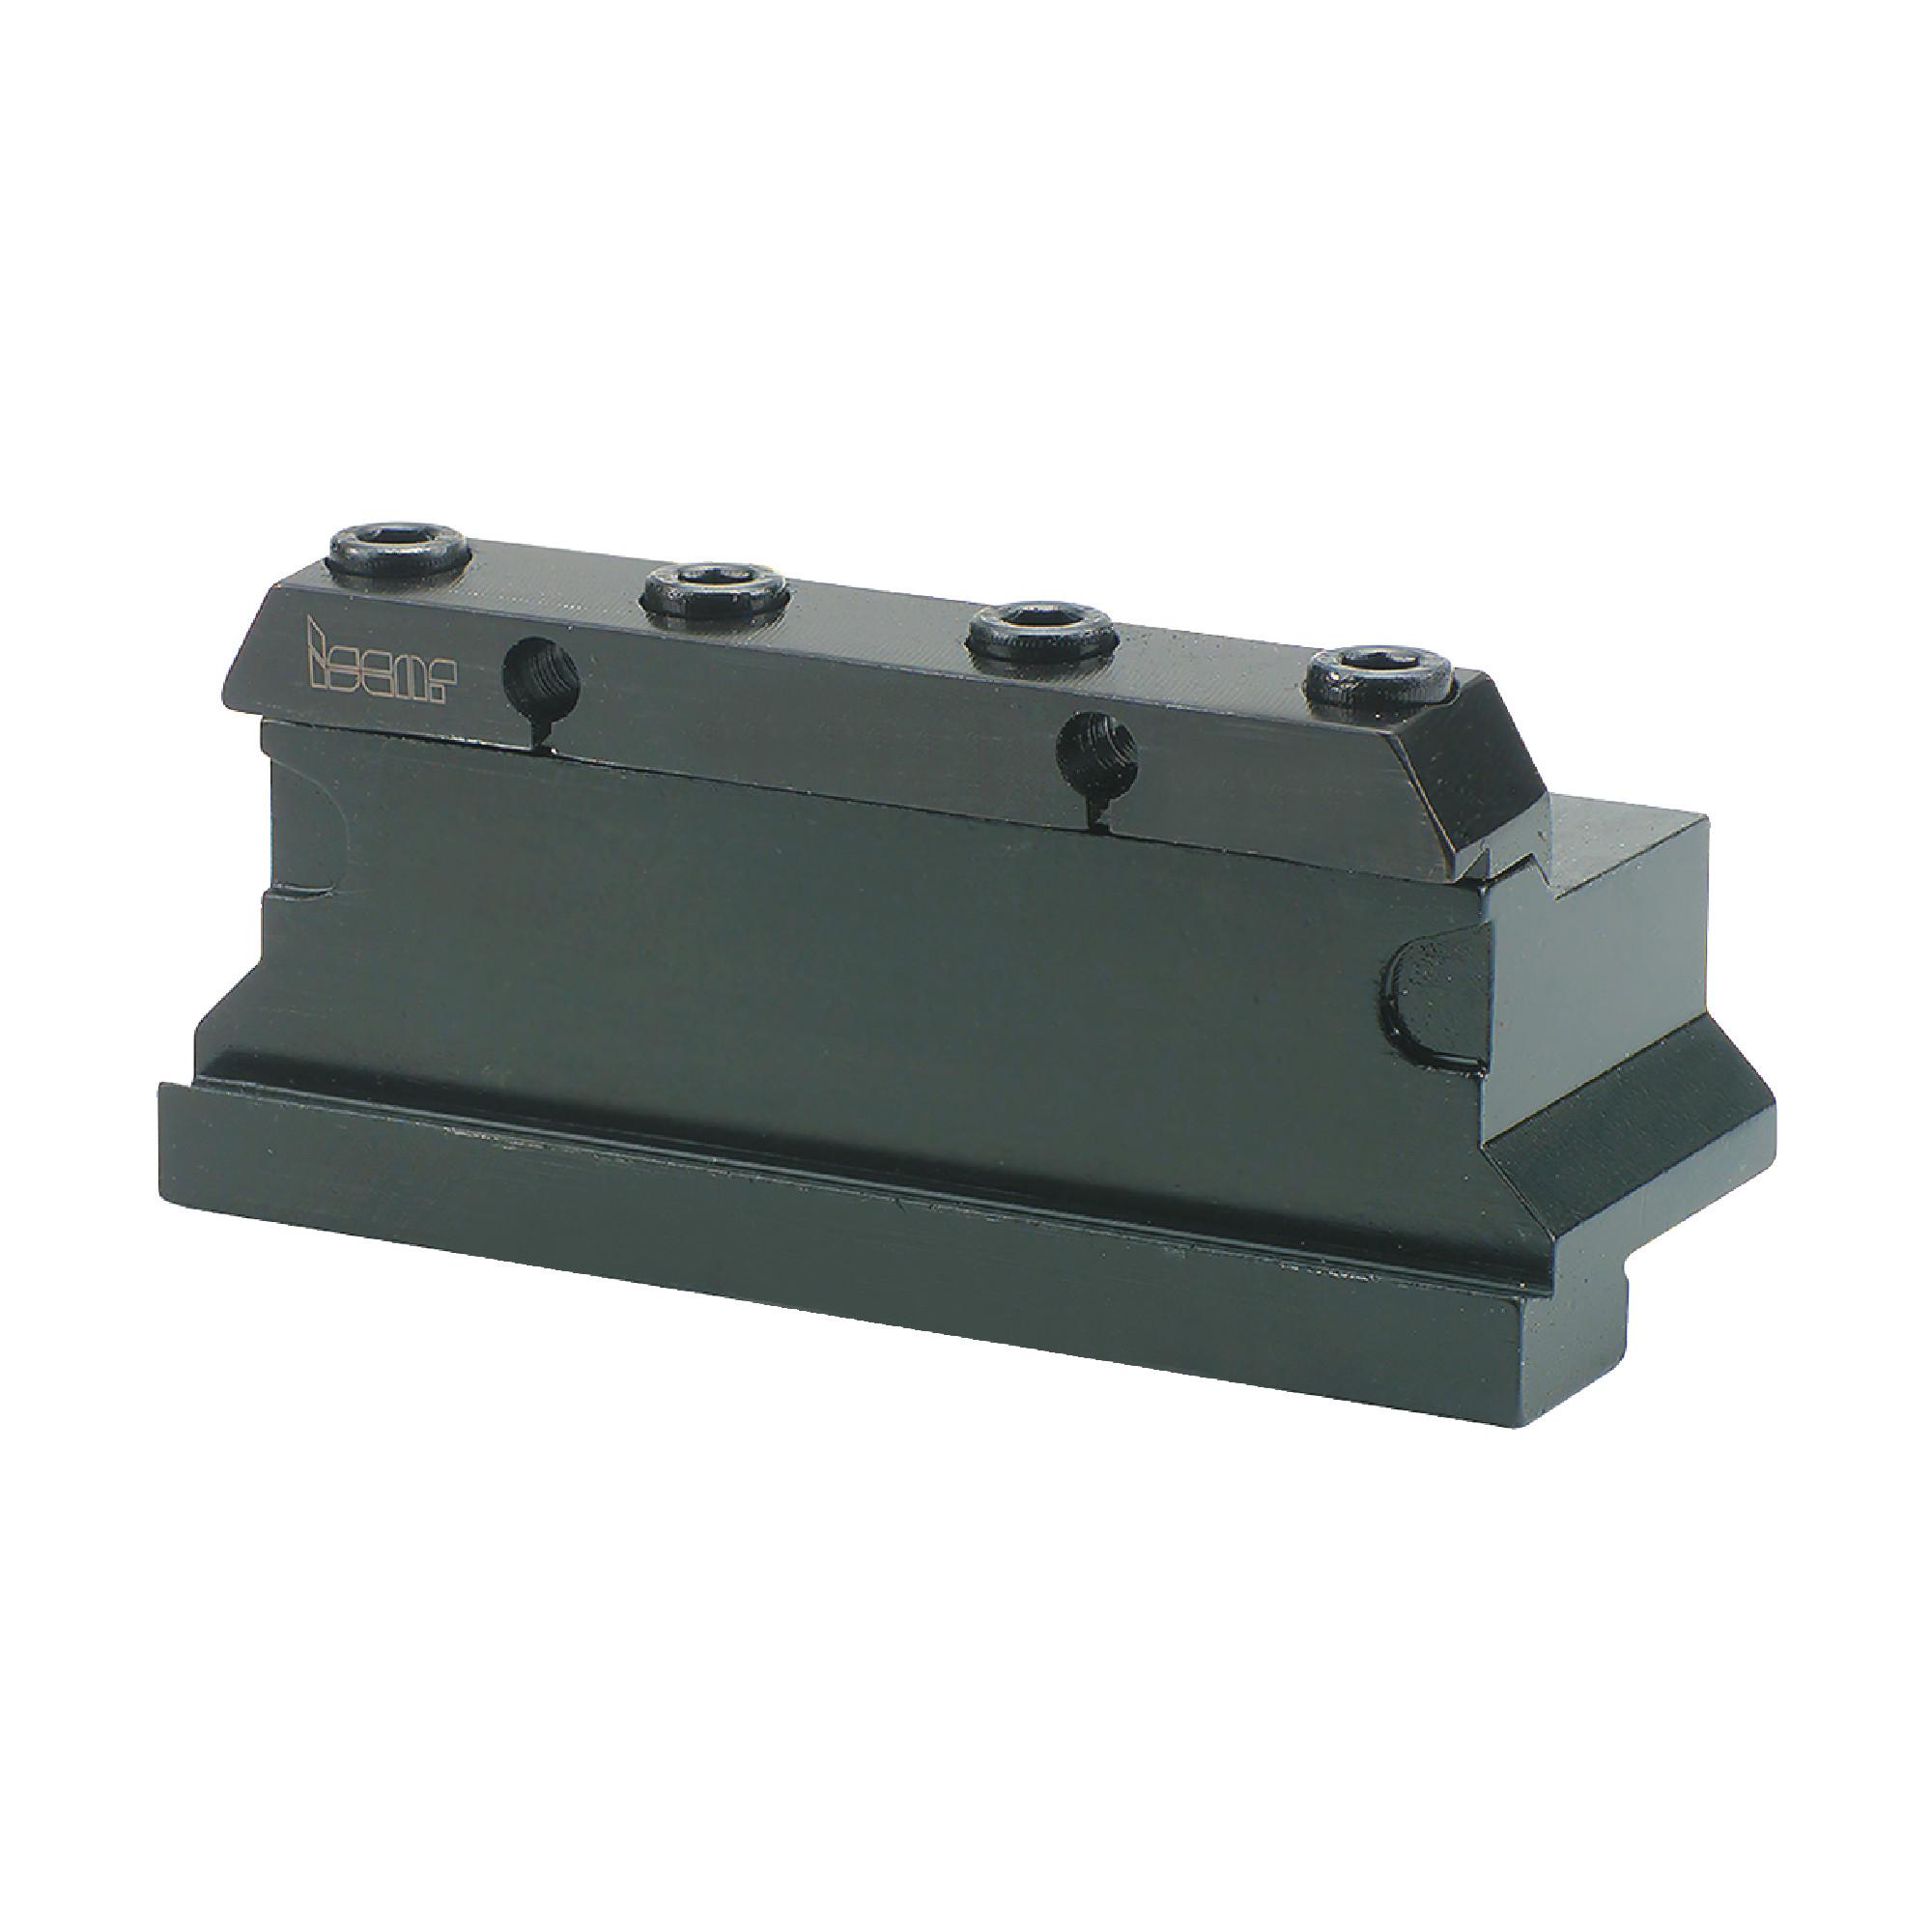 "ISCAR - SGTBU 16-5G Blade Block / .63"" X 0.63"" Shank / For 1.024"" (26mm) Height Blades"